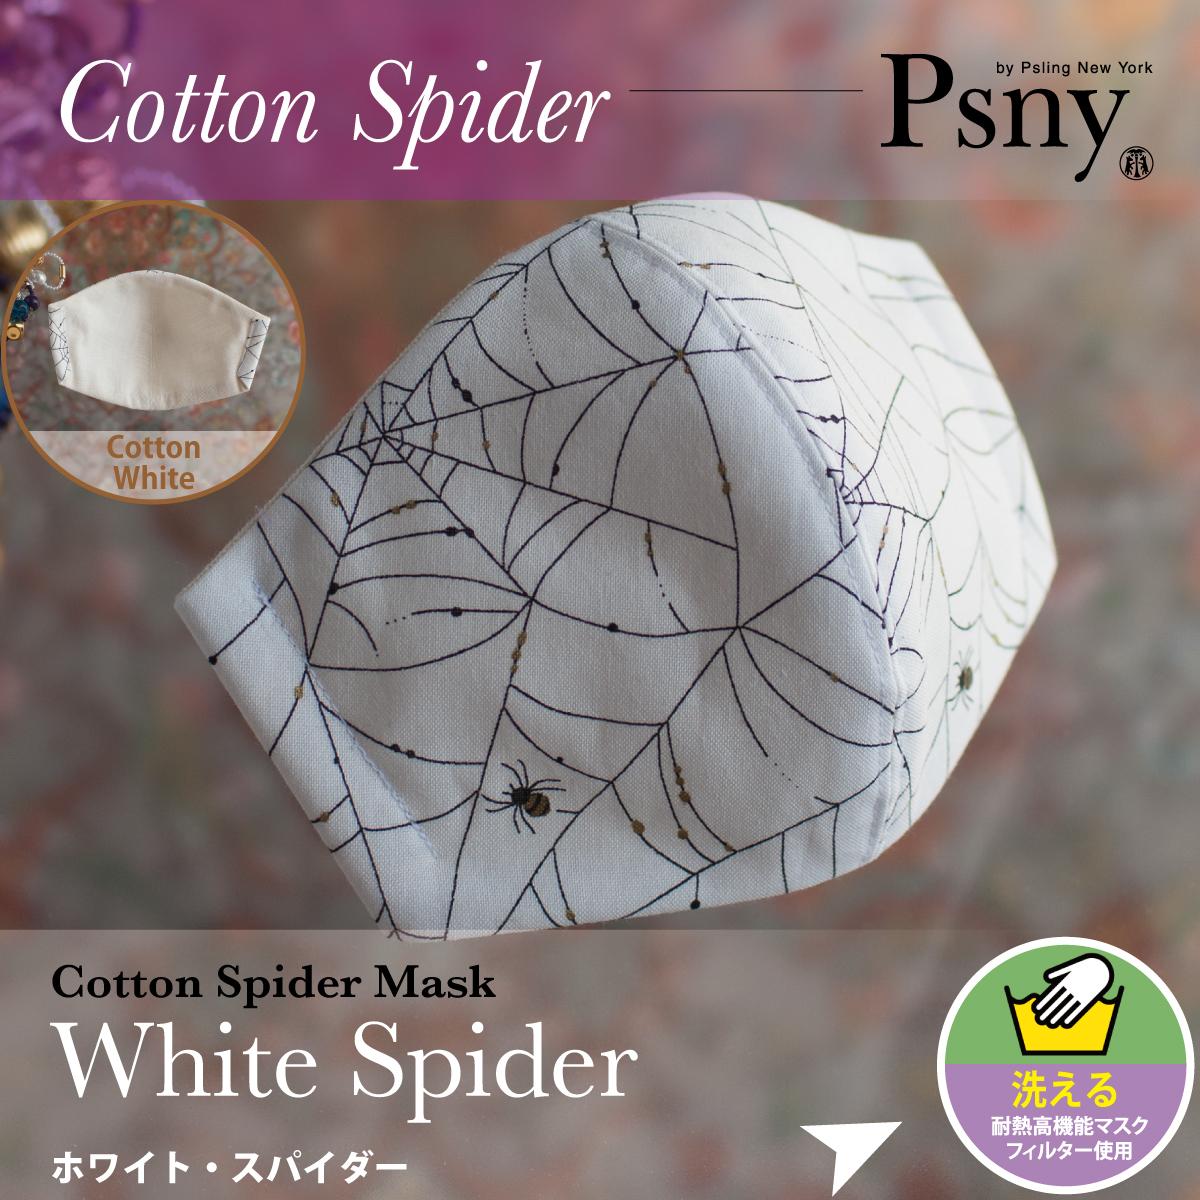 PSNY コットンスパイダー・ホワイト 花粉 黄砂 洗えるフィルター入り 立体 マスク 大人用 送料無料